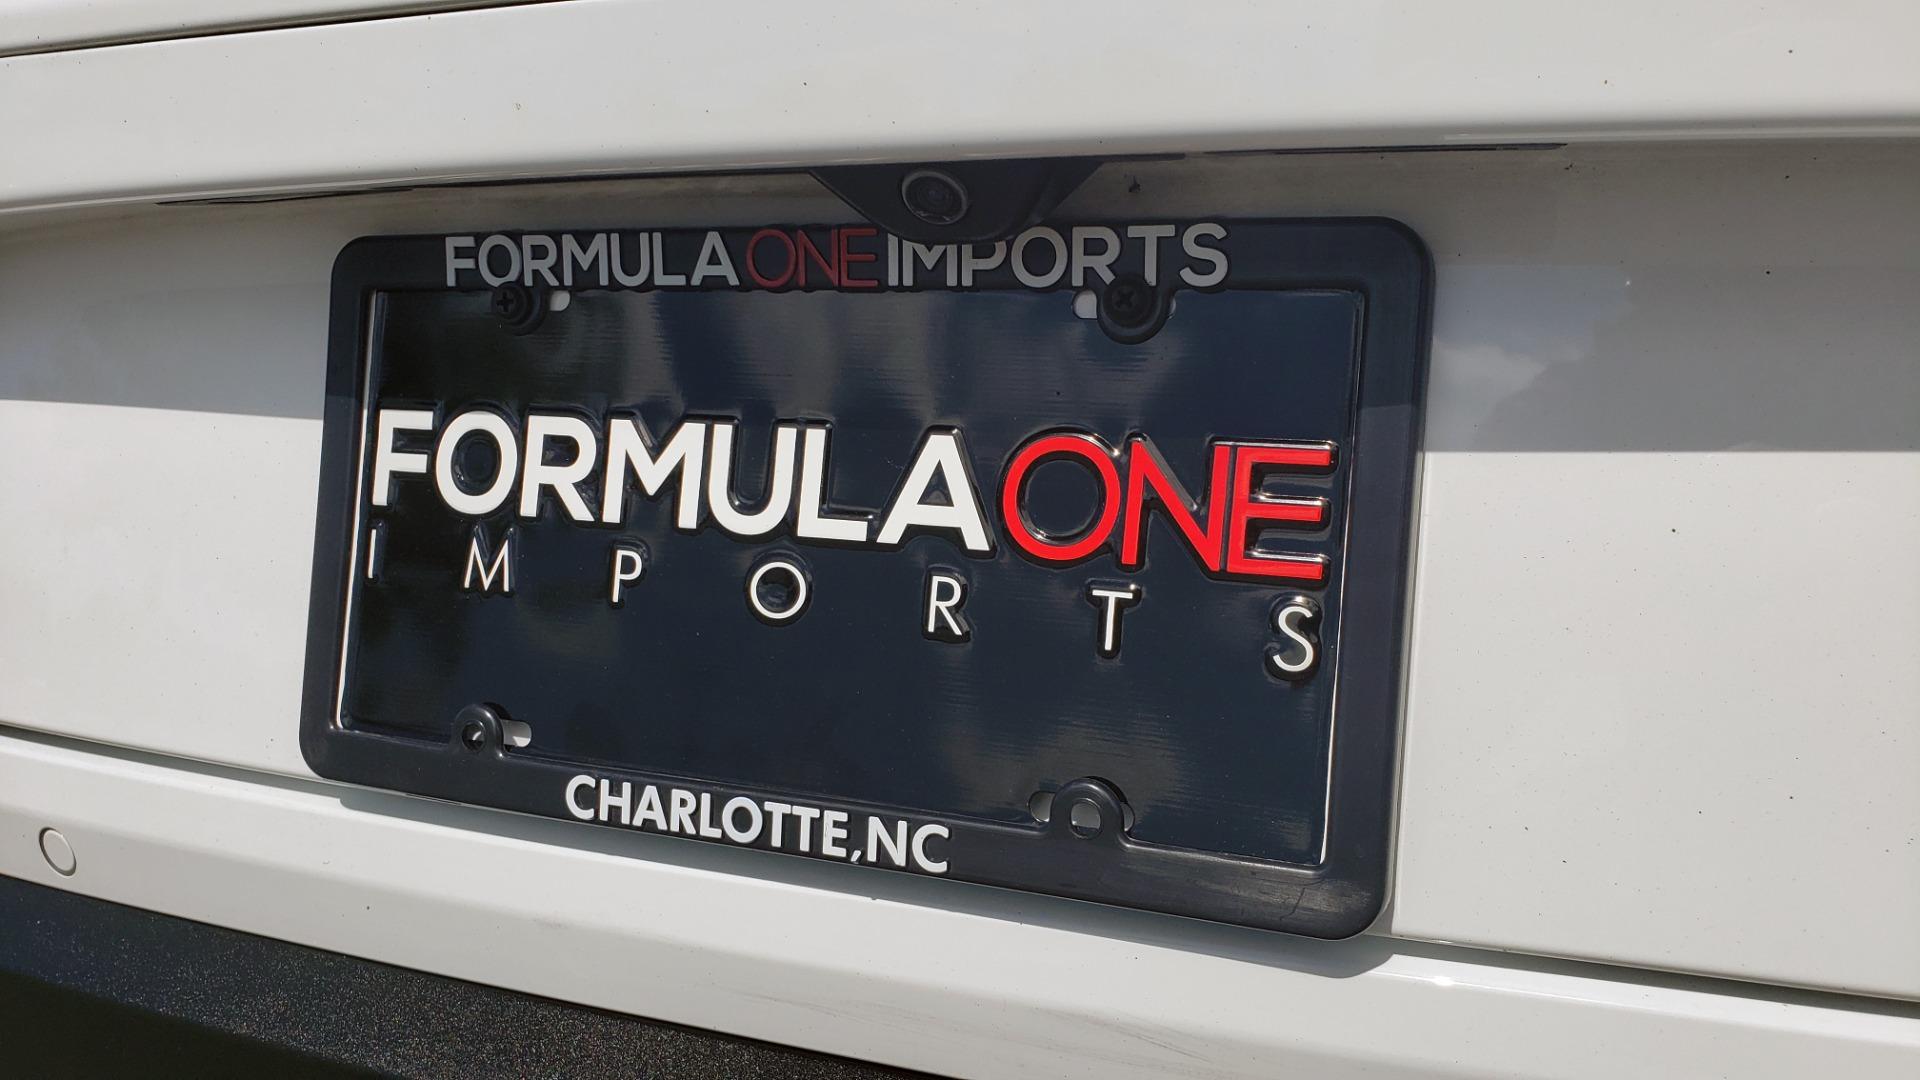 Used 2019 Alfa Romeo STELVIO TI SPORT AWD / 2.0L TURBO / 8-SPD AUTO / DRVR ASST / REARVIEW for sale $37,495 at Formula Imports in Charlotte NC 28227 36